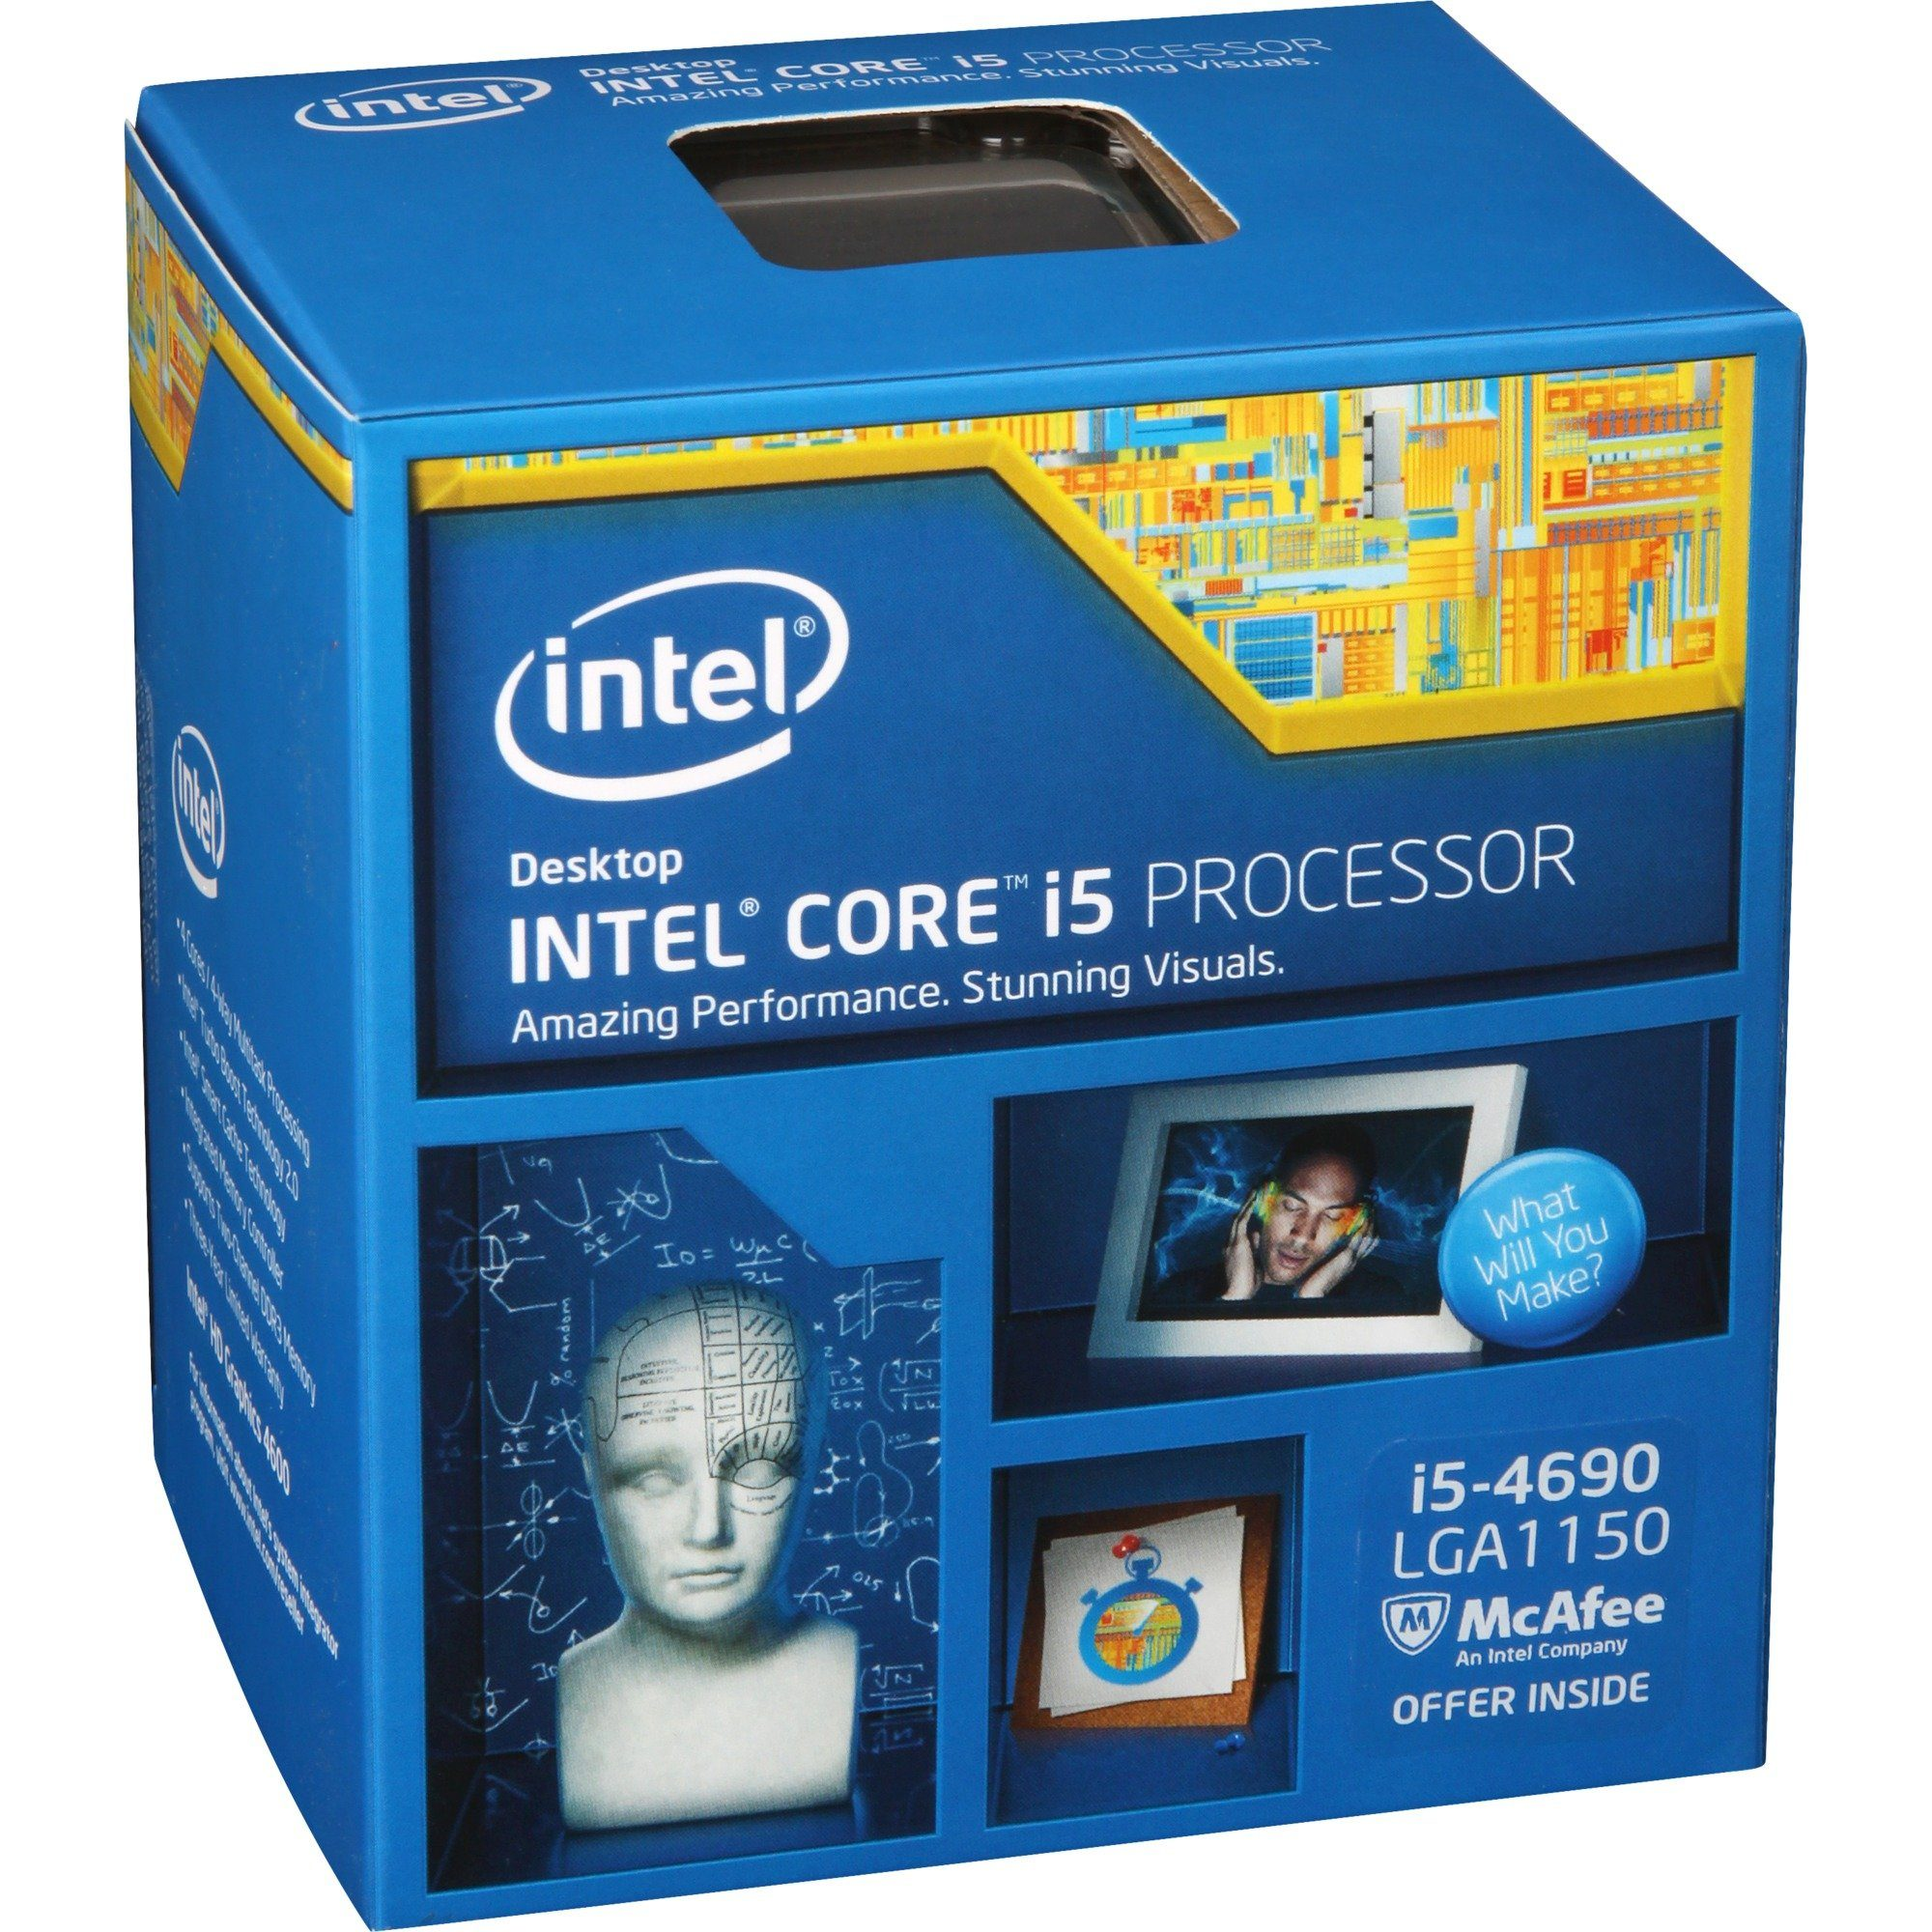 Intel® Prozessor »Core(TM) i5-4690«